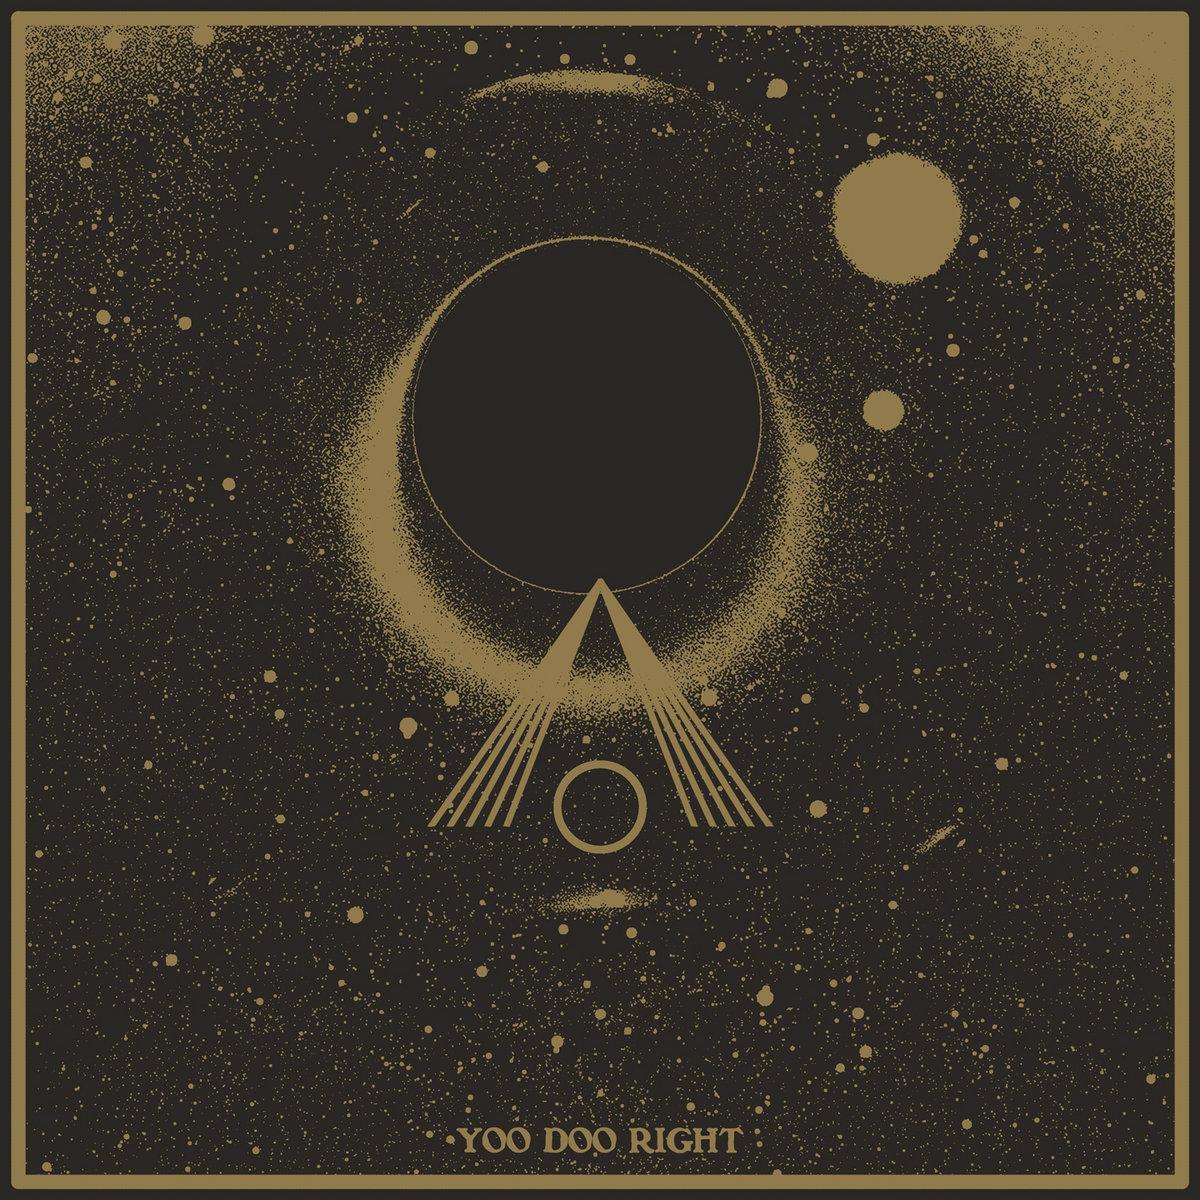 Yoo Doo Right Album Cover